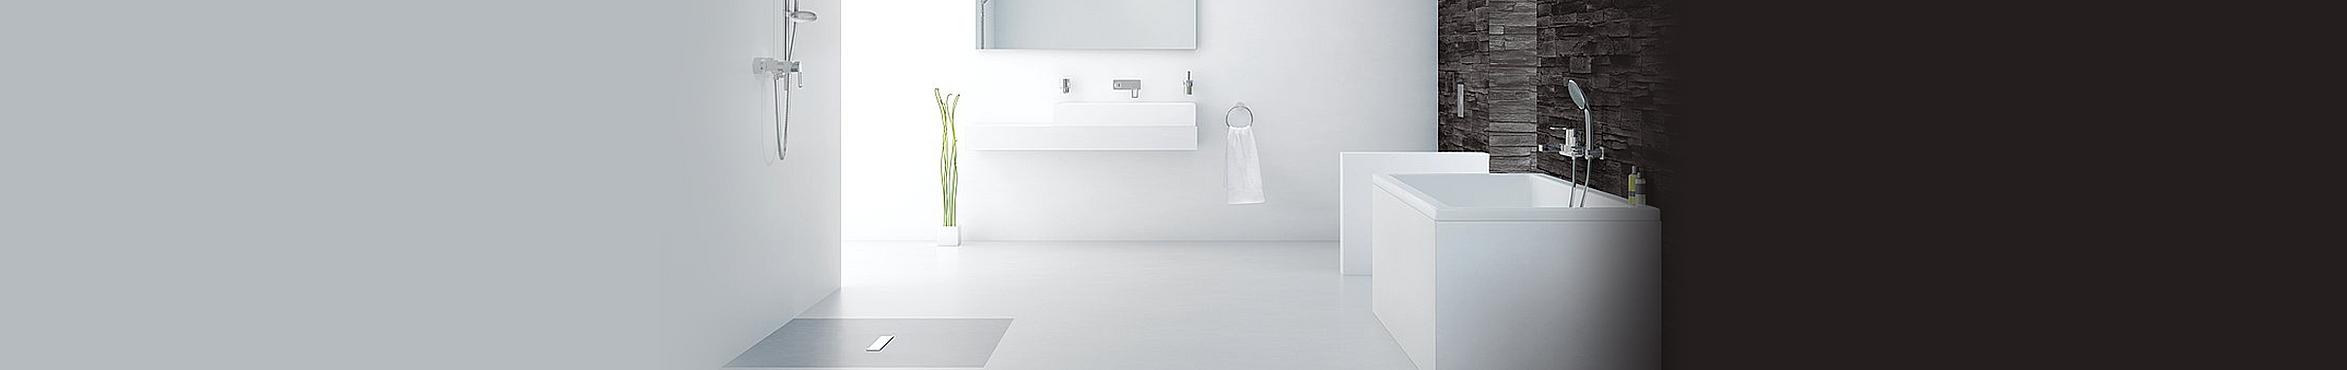 haustechnik wittmaack installateur in starnberg. Black Bedroom Furniture Sets. Home Design Ideas